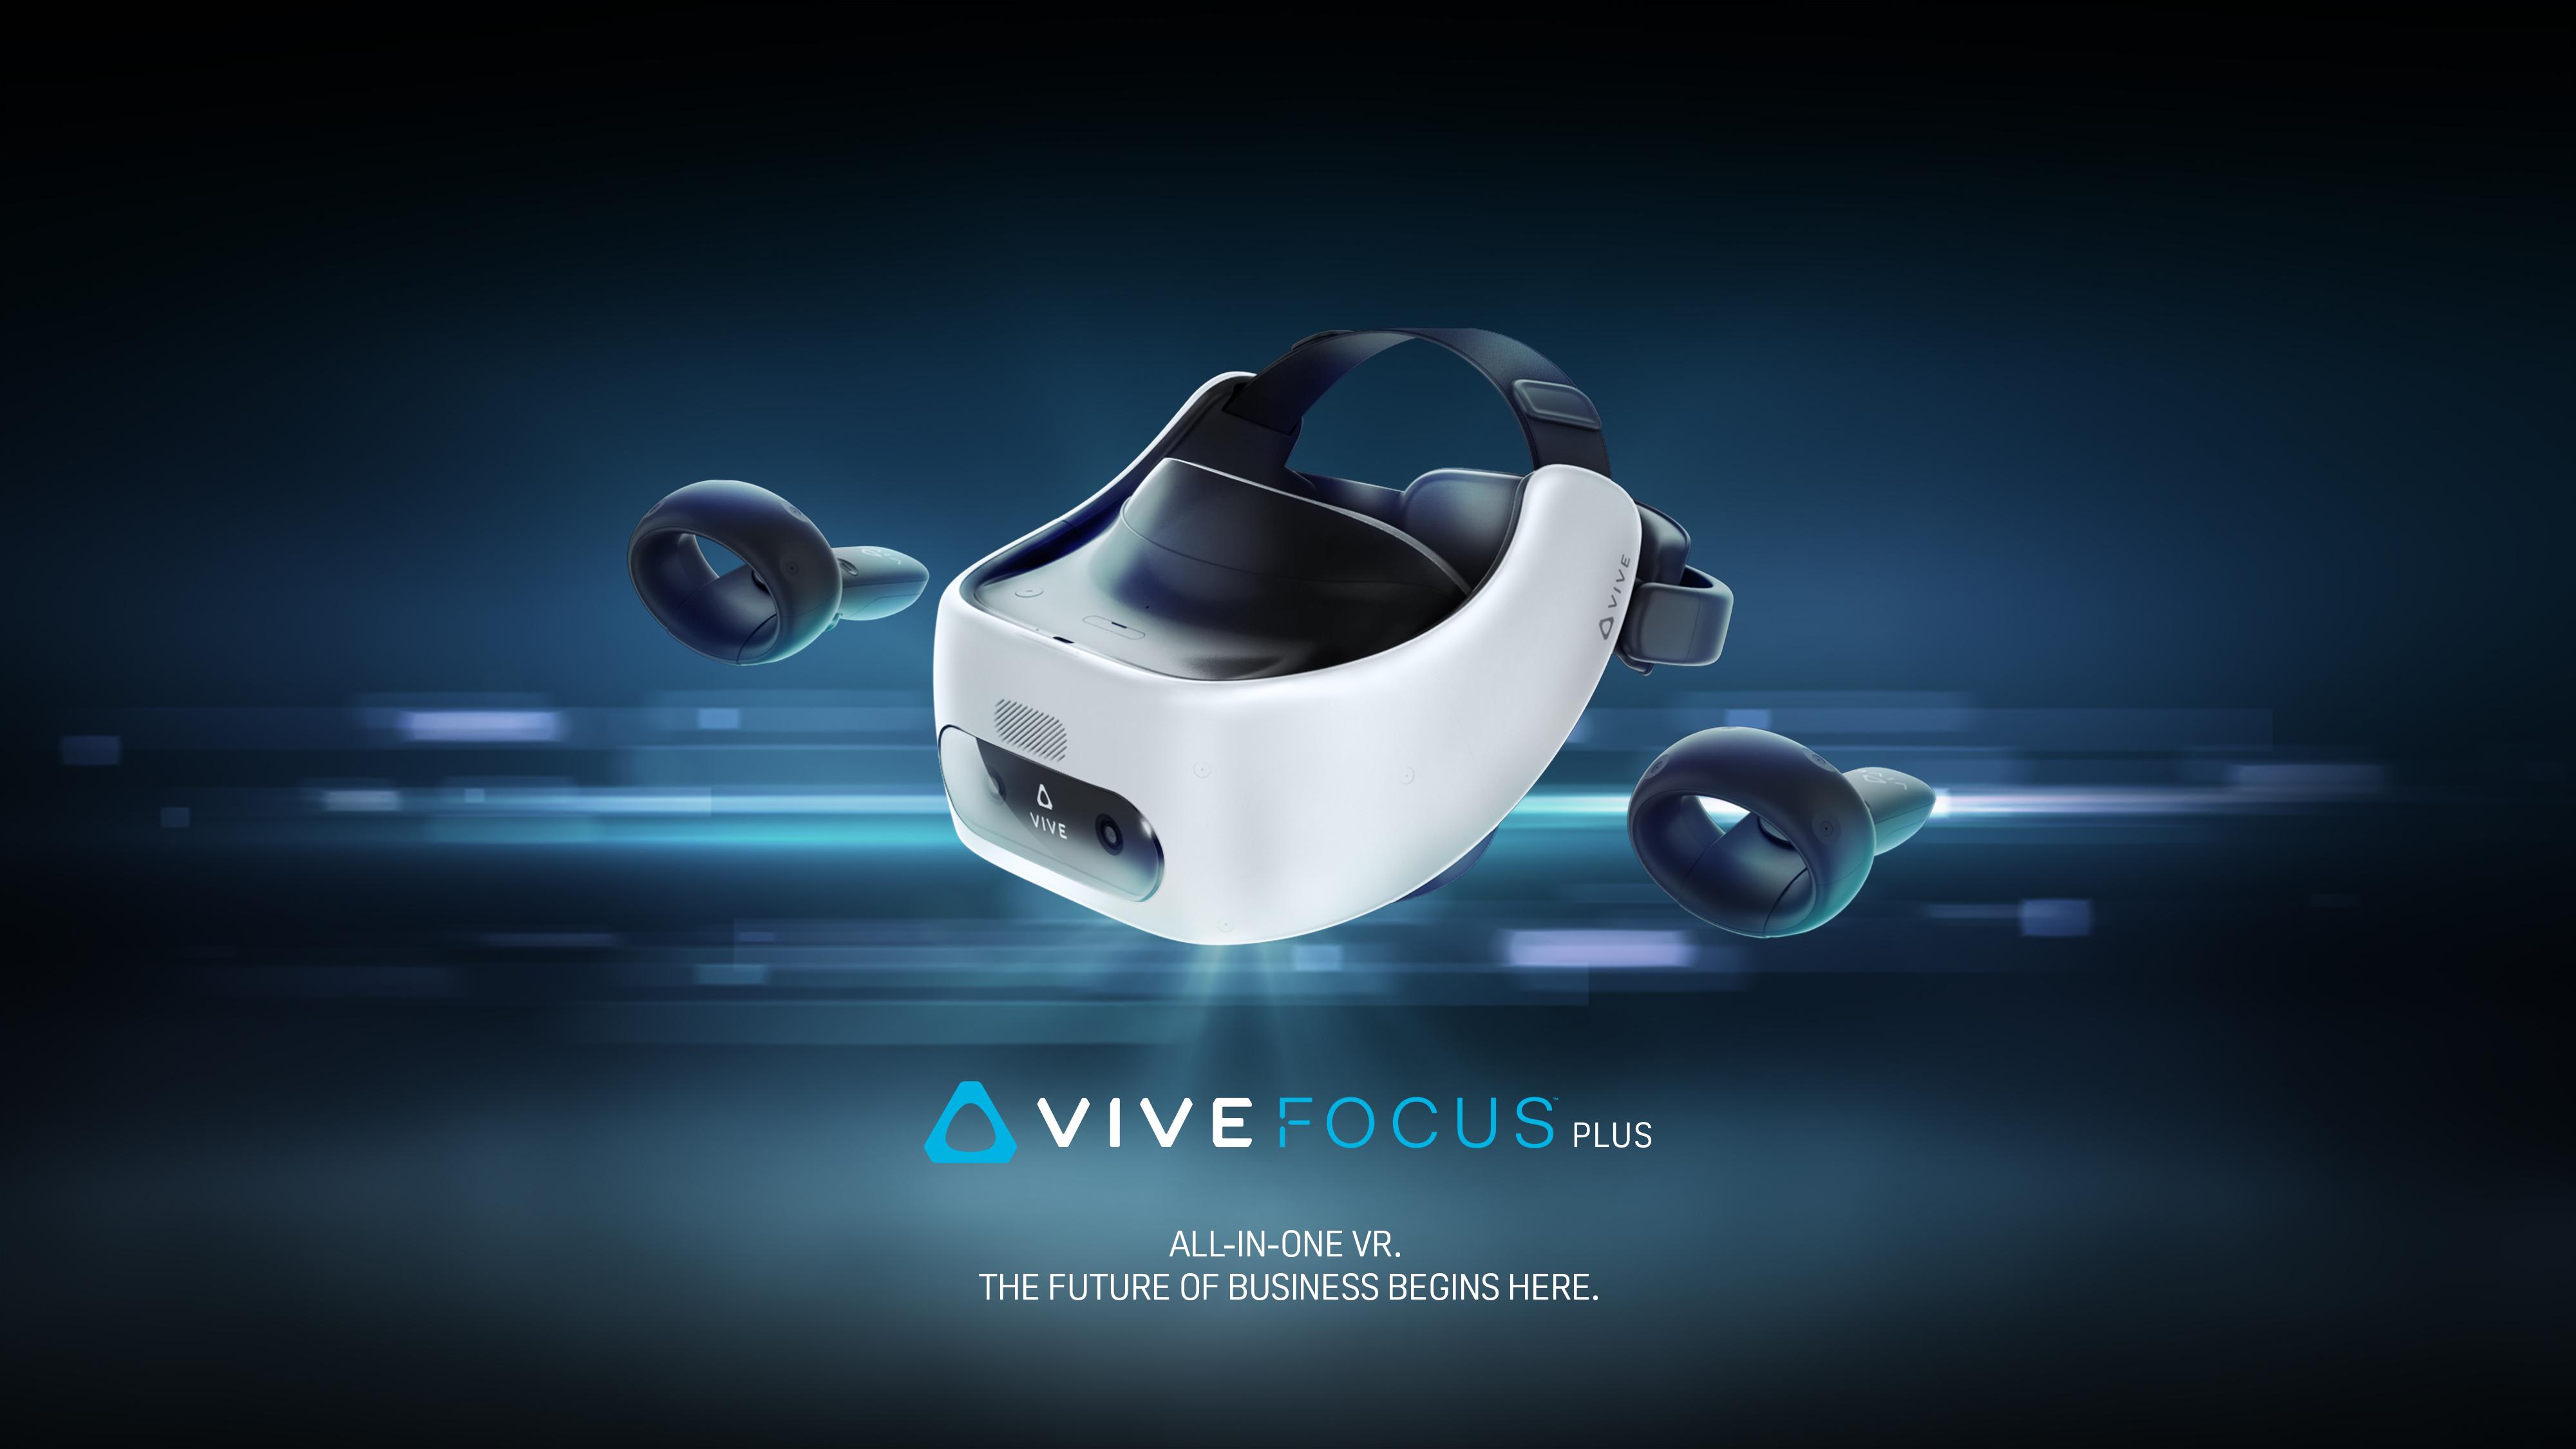 HTC VIVE prezintă la MWC experiențe VR premium și 5G